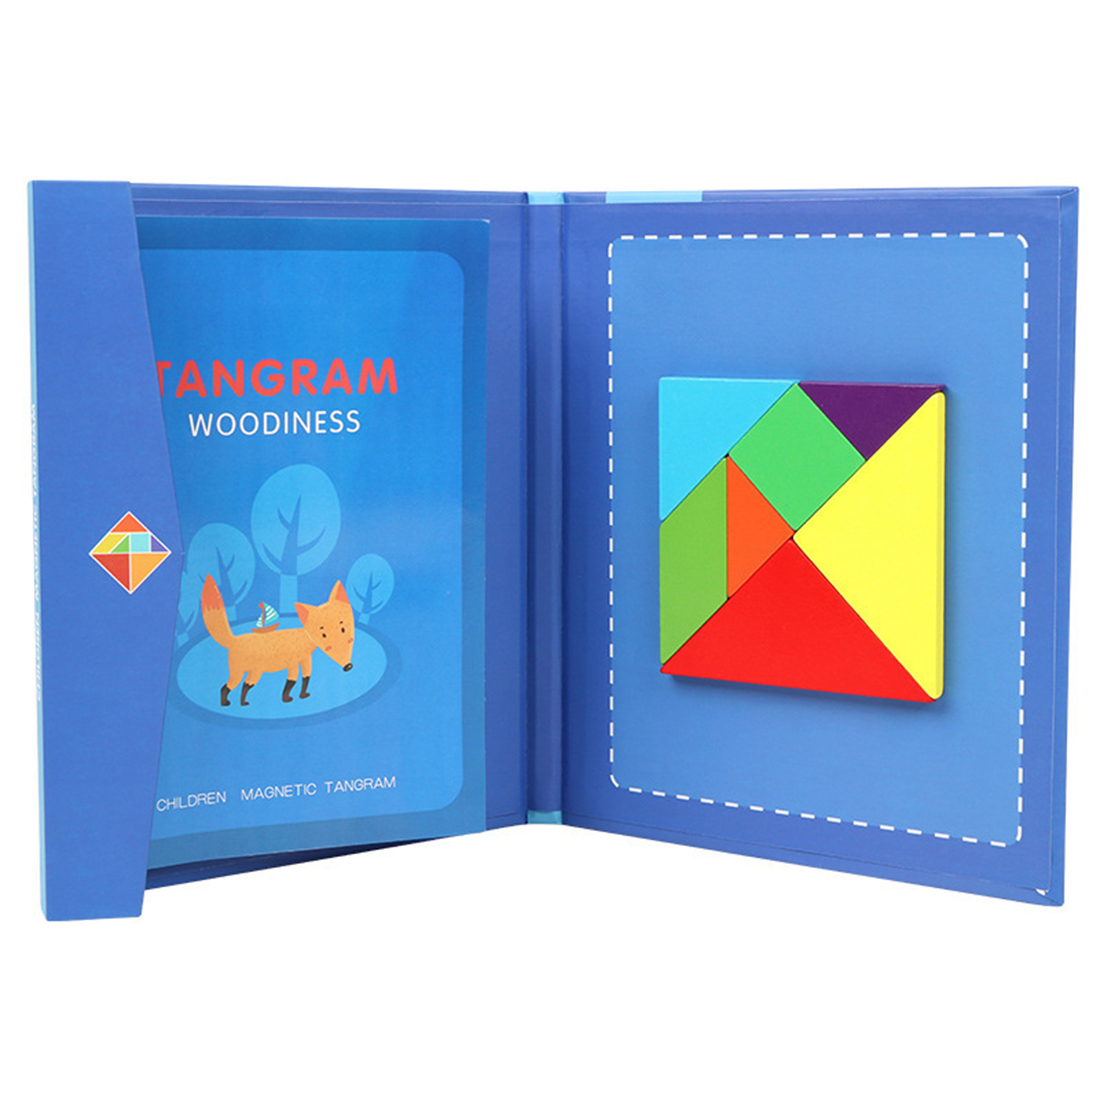 Children Wooden Magnetic Tangram Travel Game Educational Book For Kids Over 3 Age